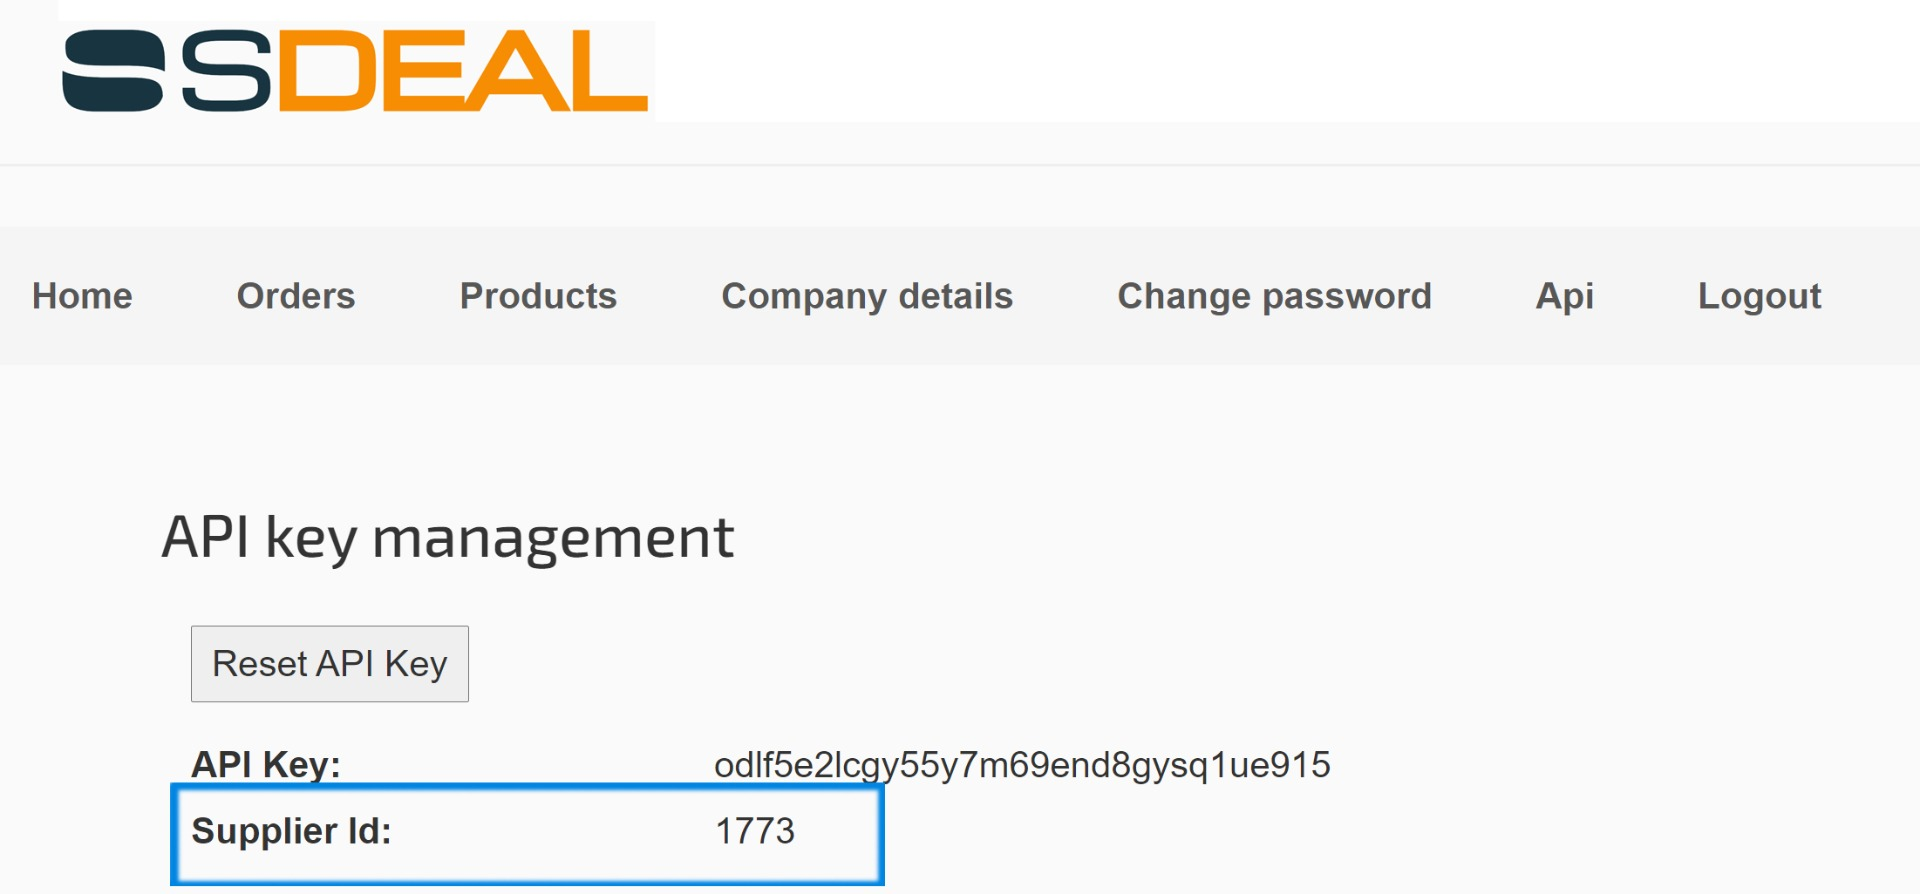 API Supplier ID